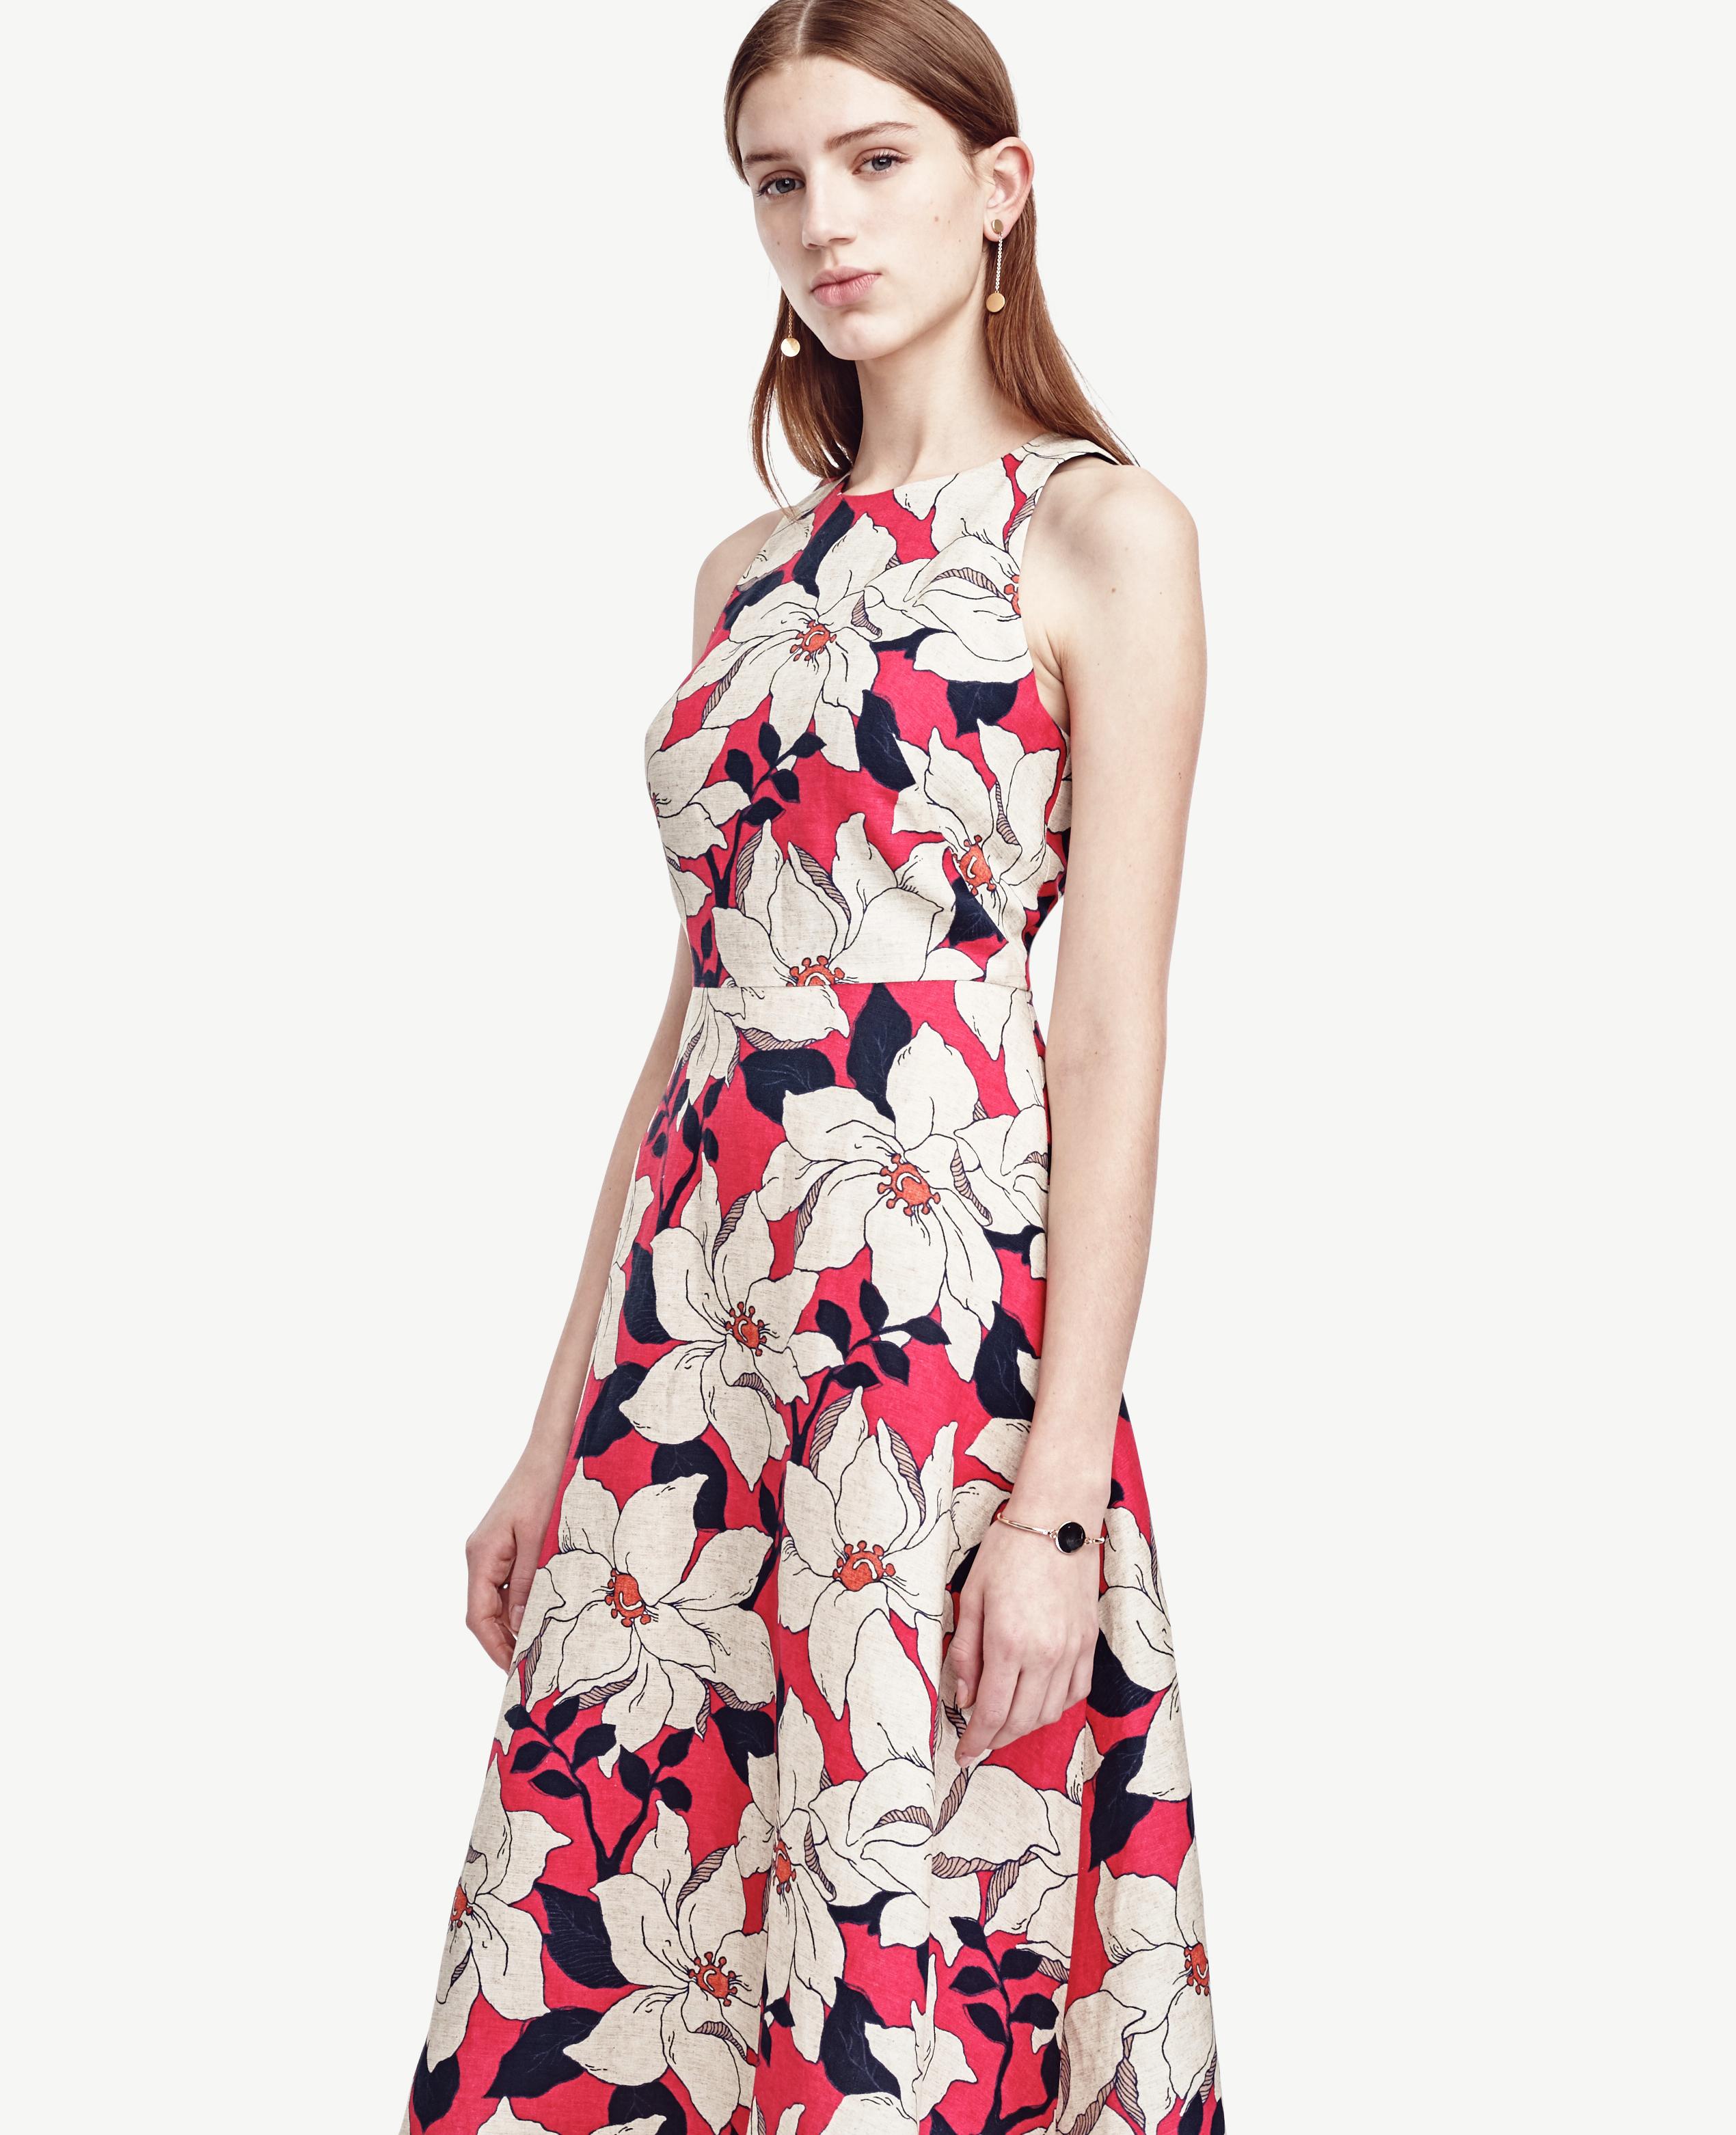 Lyst ann taylor hibiscus midi dress gallery izmirmasajfo